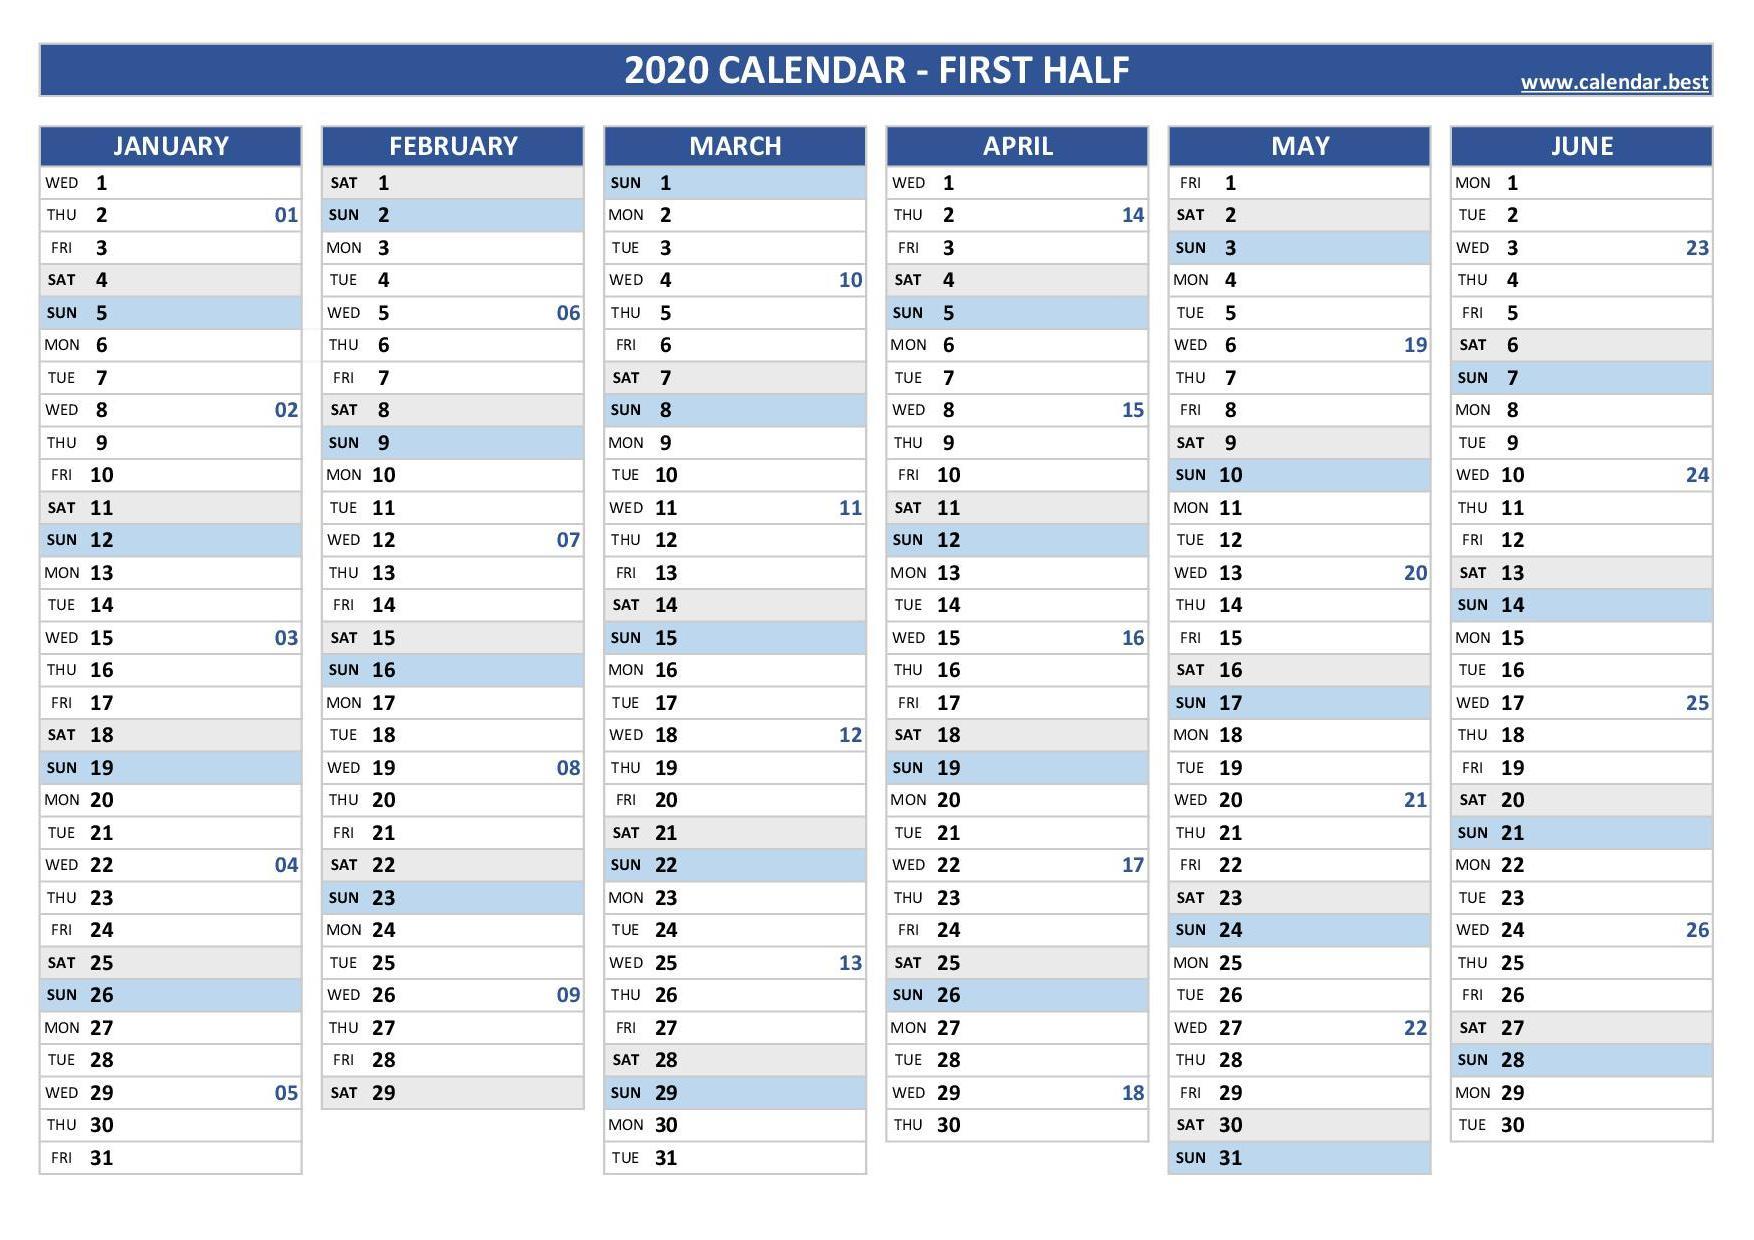 2020 Half Year Calendar -Calendar.best pertaining to Half-Page Yearly Callendar